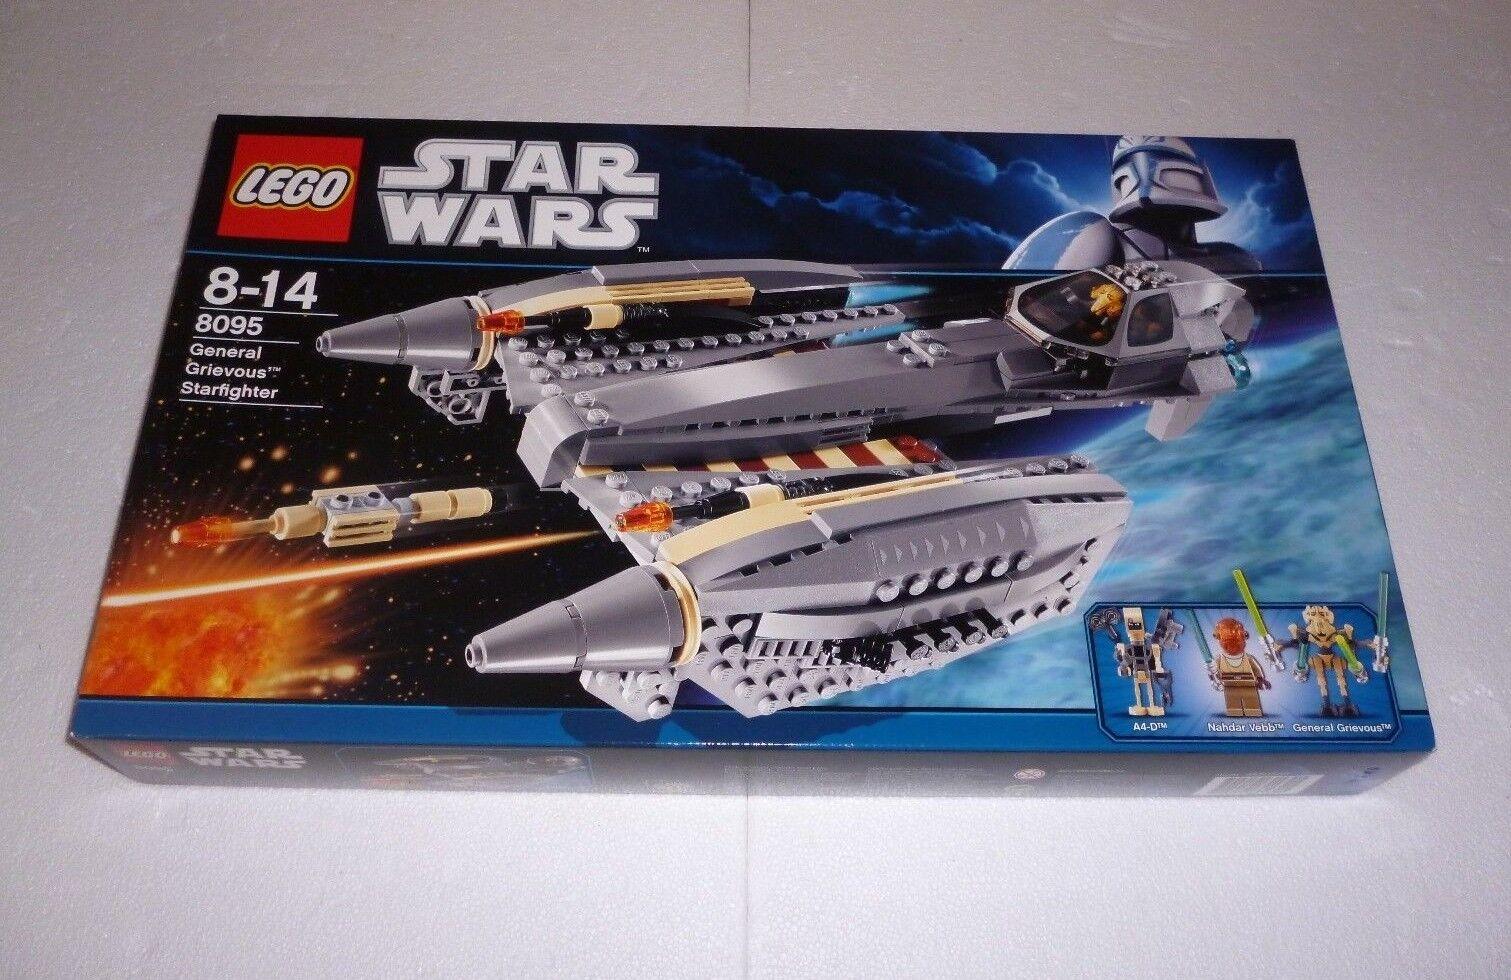 LEGO StarWars General Grievous' Starfighter (8095) NEU / NEW OVP